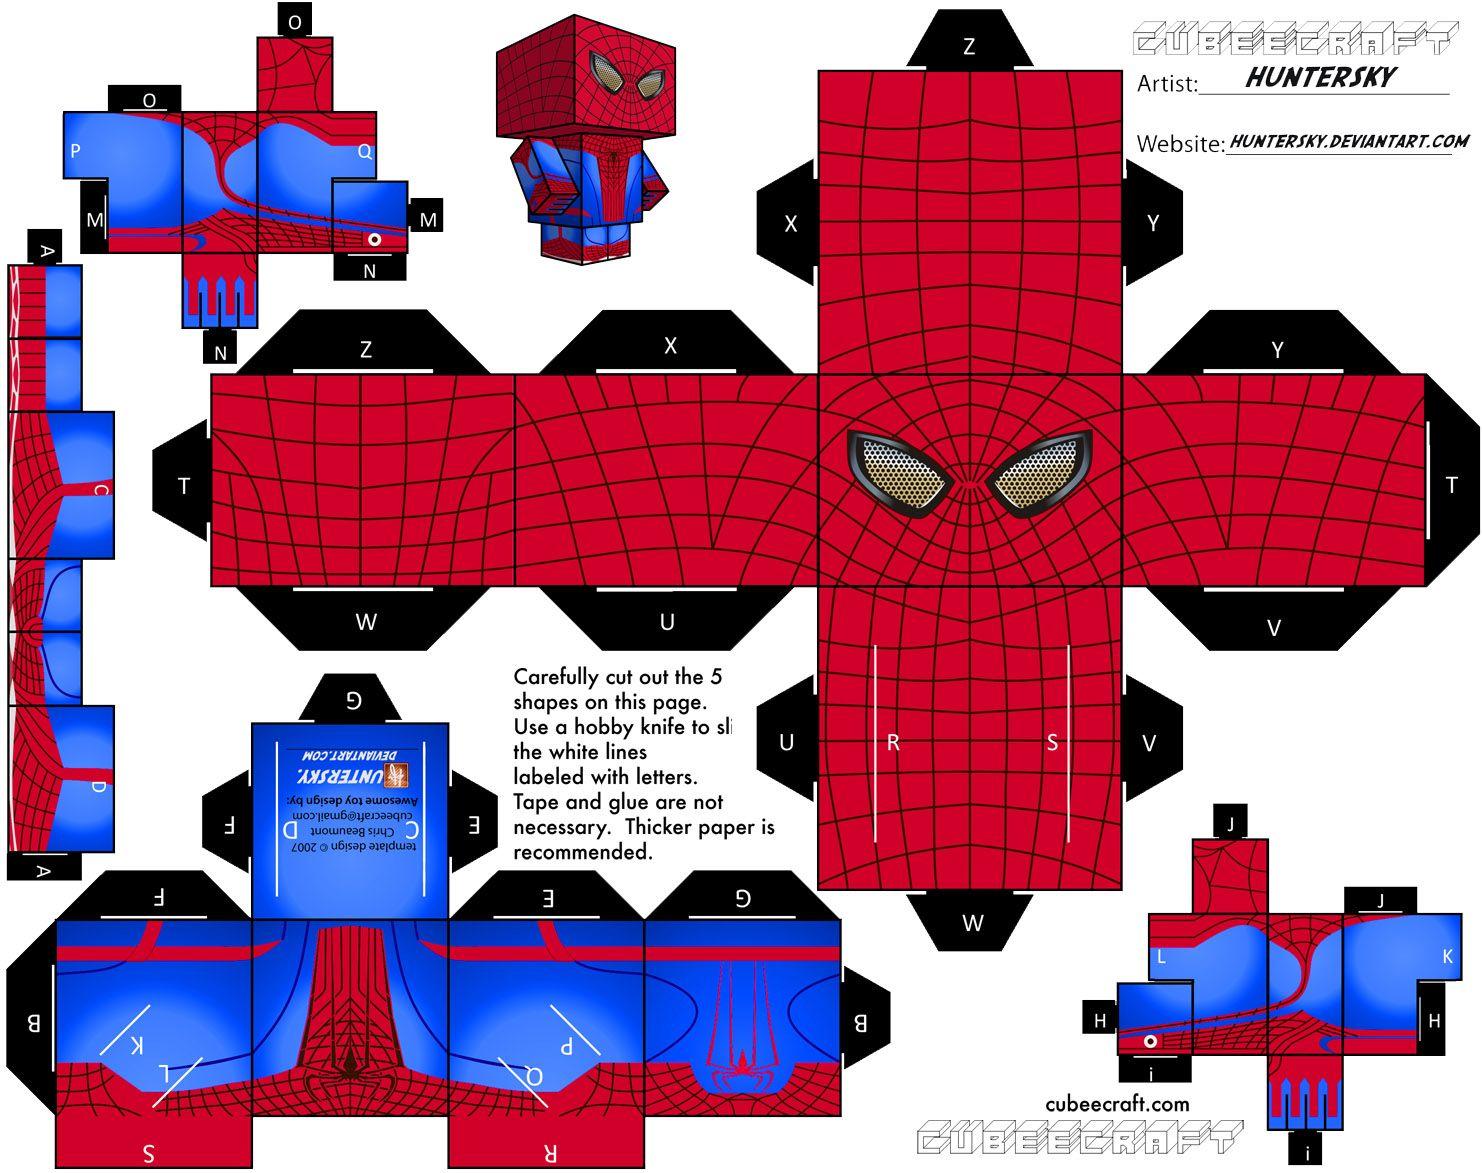 Mi regalo de navidad para ustedes! MEGApost Cubecrafts! | Pinterest ...